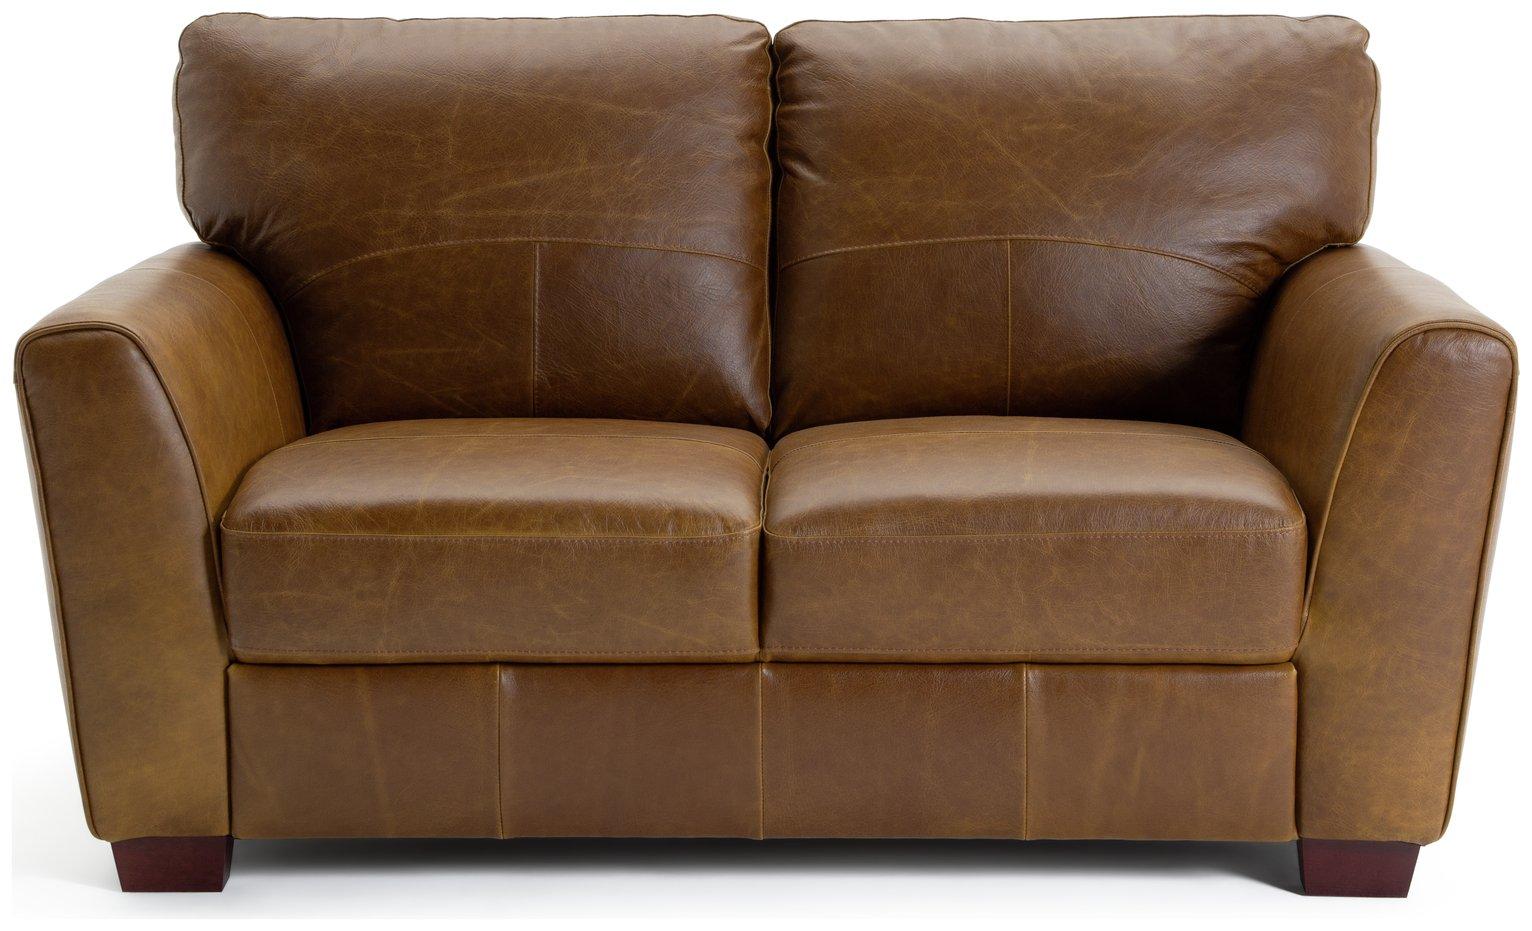 Habitat Milford 2 Seater Leather Sofa - Tan